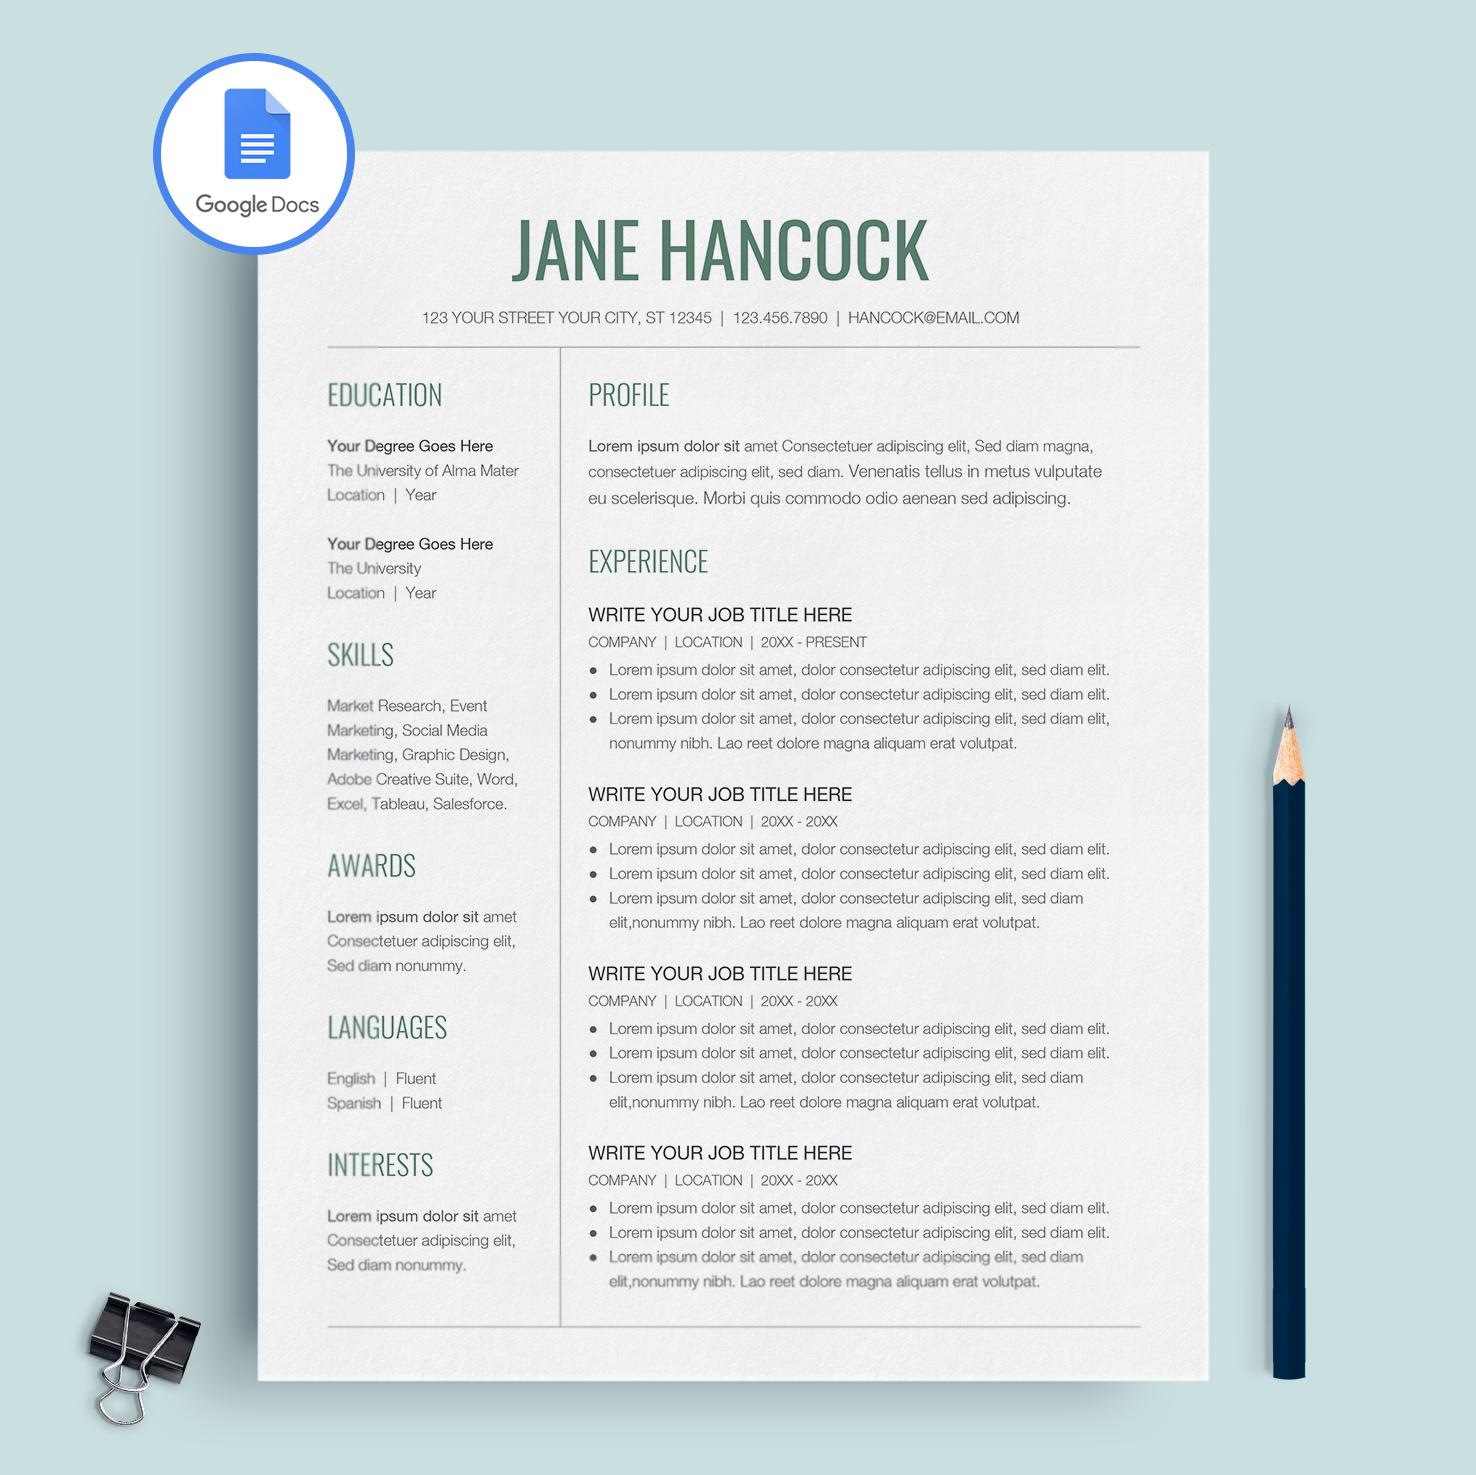 Jane Hancock Google Docs Resume Template CV Template